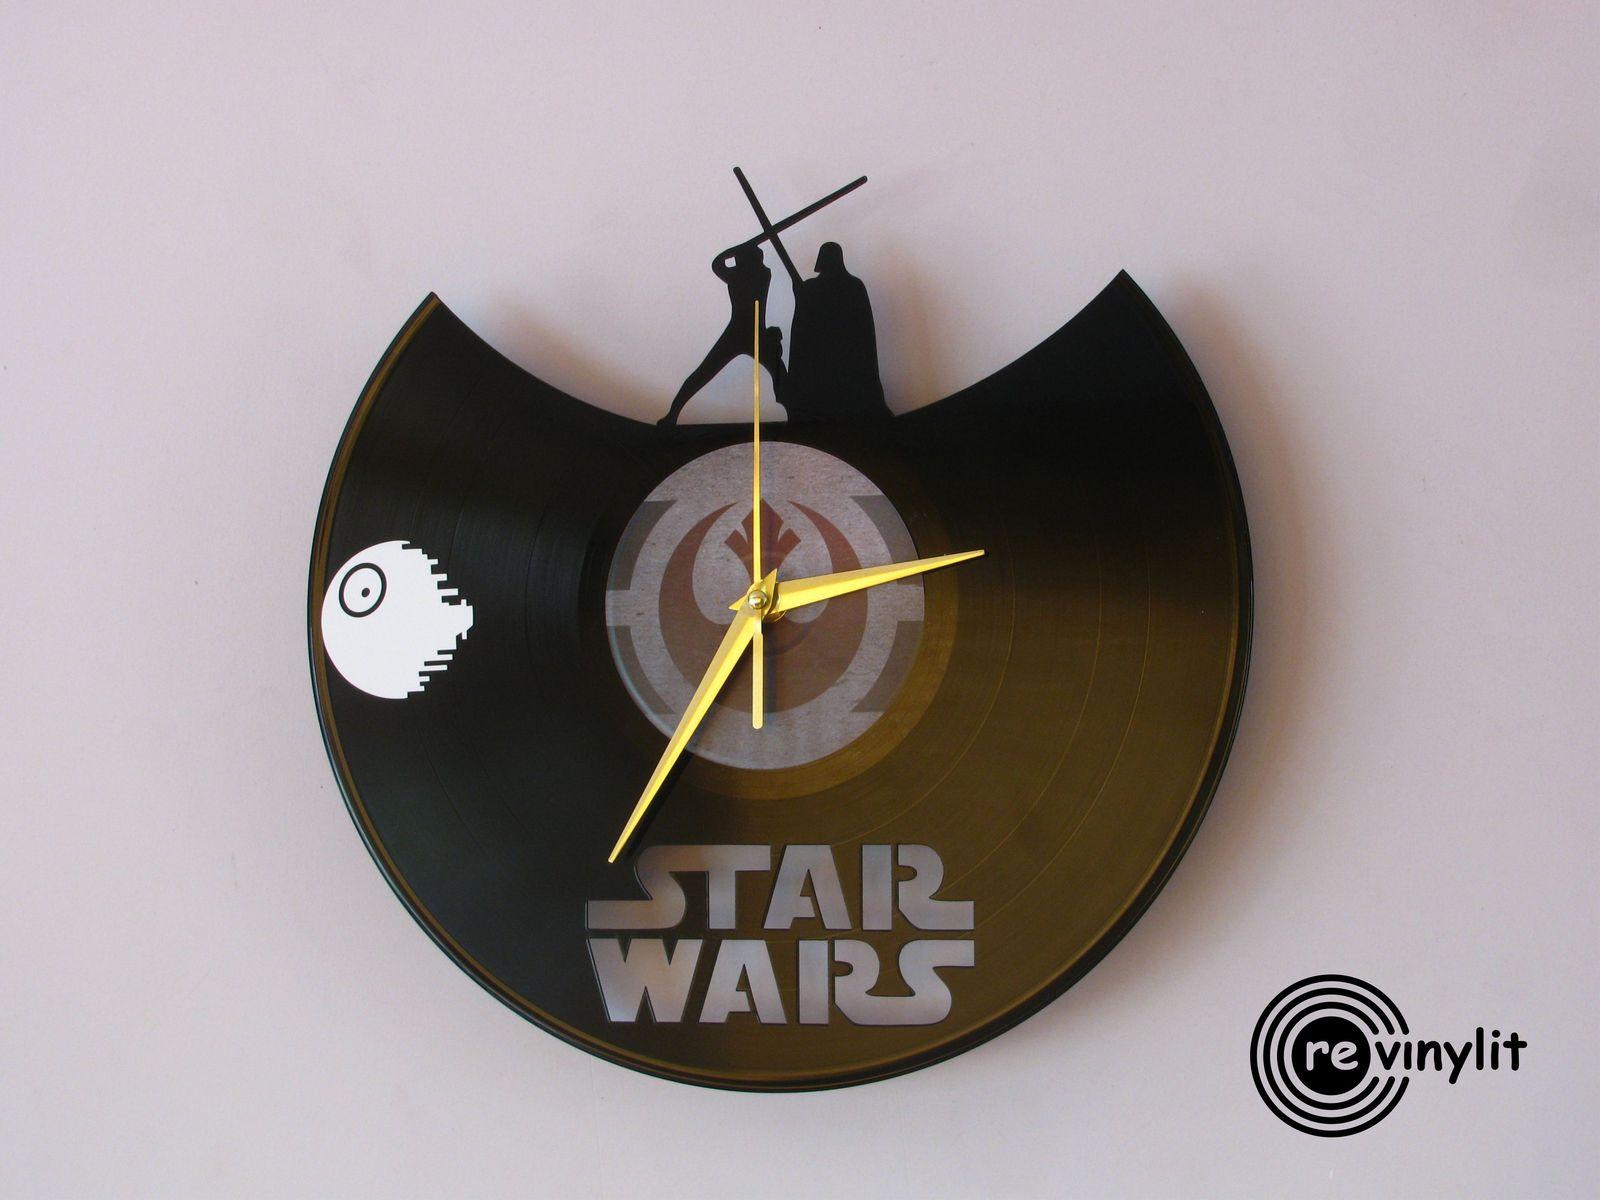 vinyl record clock star wars revinylit wall clocks. Black Bedroom Furniture Sets. Home Design Ideas